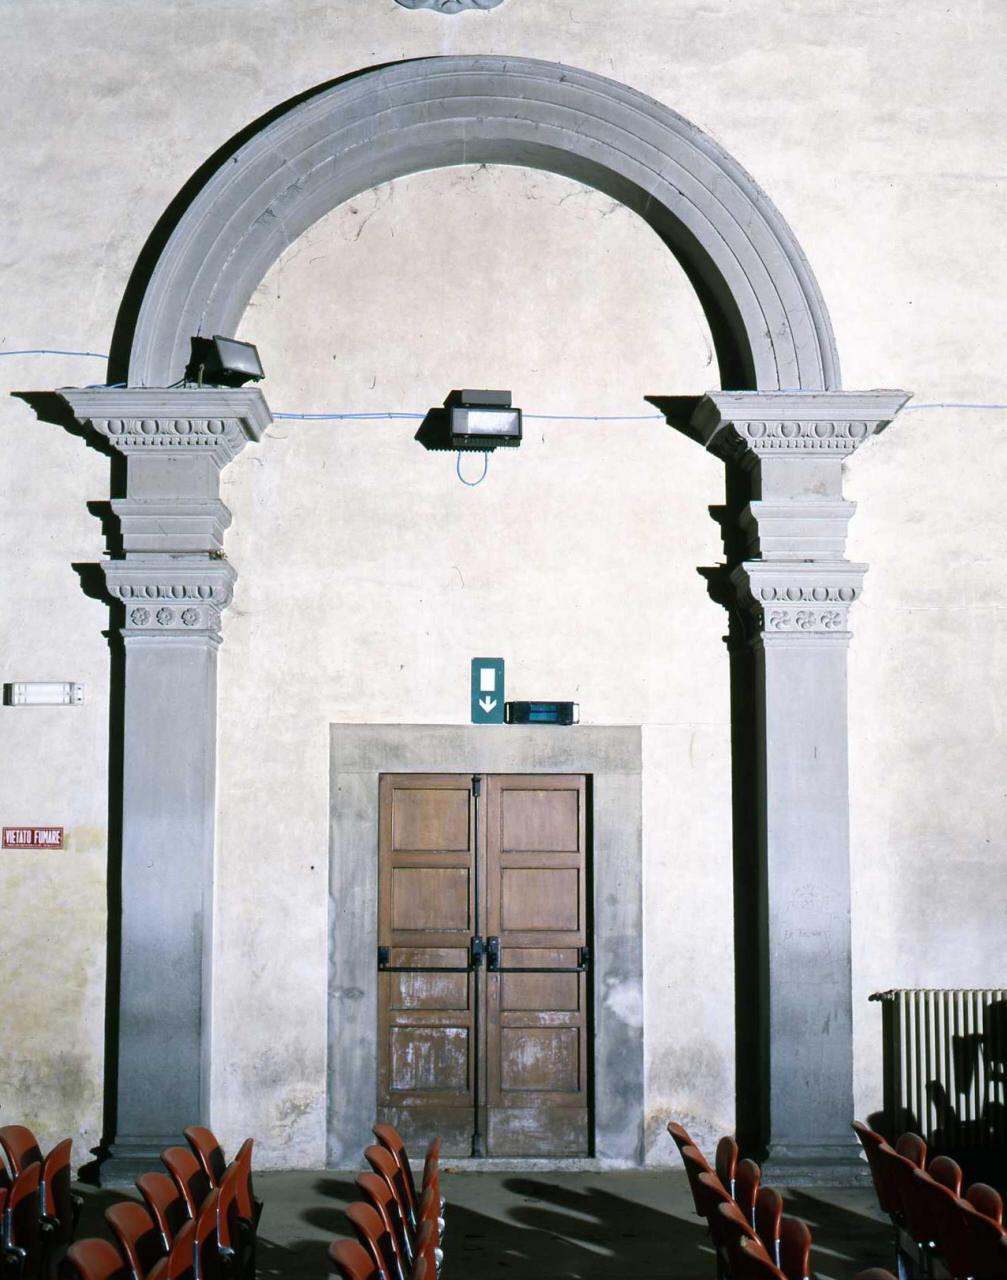 arco, serie - produzione toscana (sec. XVI)